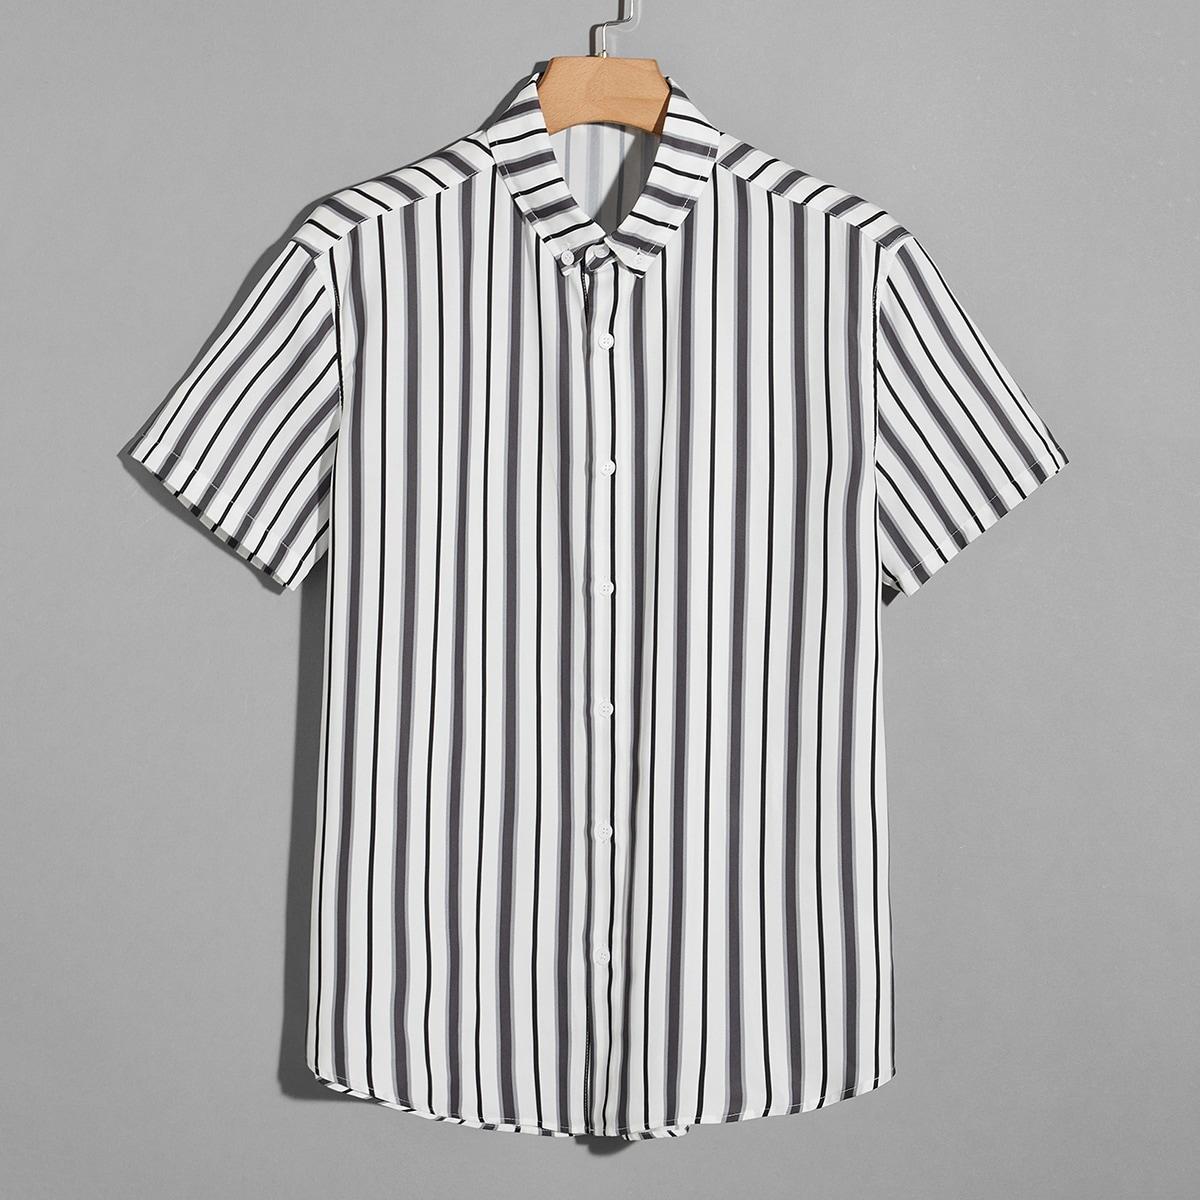 Мужская рубашка на пуговицах в полоску SheIn smshirt07210525545